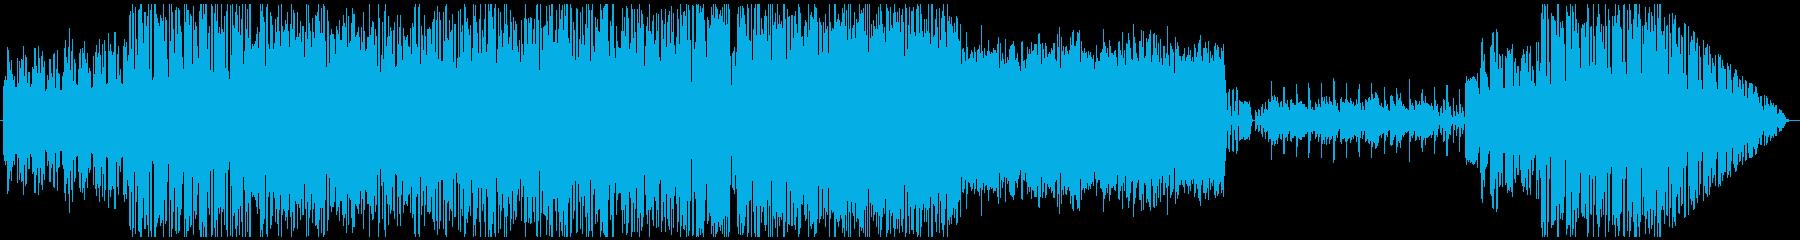 EDM系にピアノをぶち込んだ爽快ロックの再生済みの波形